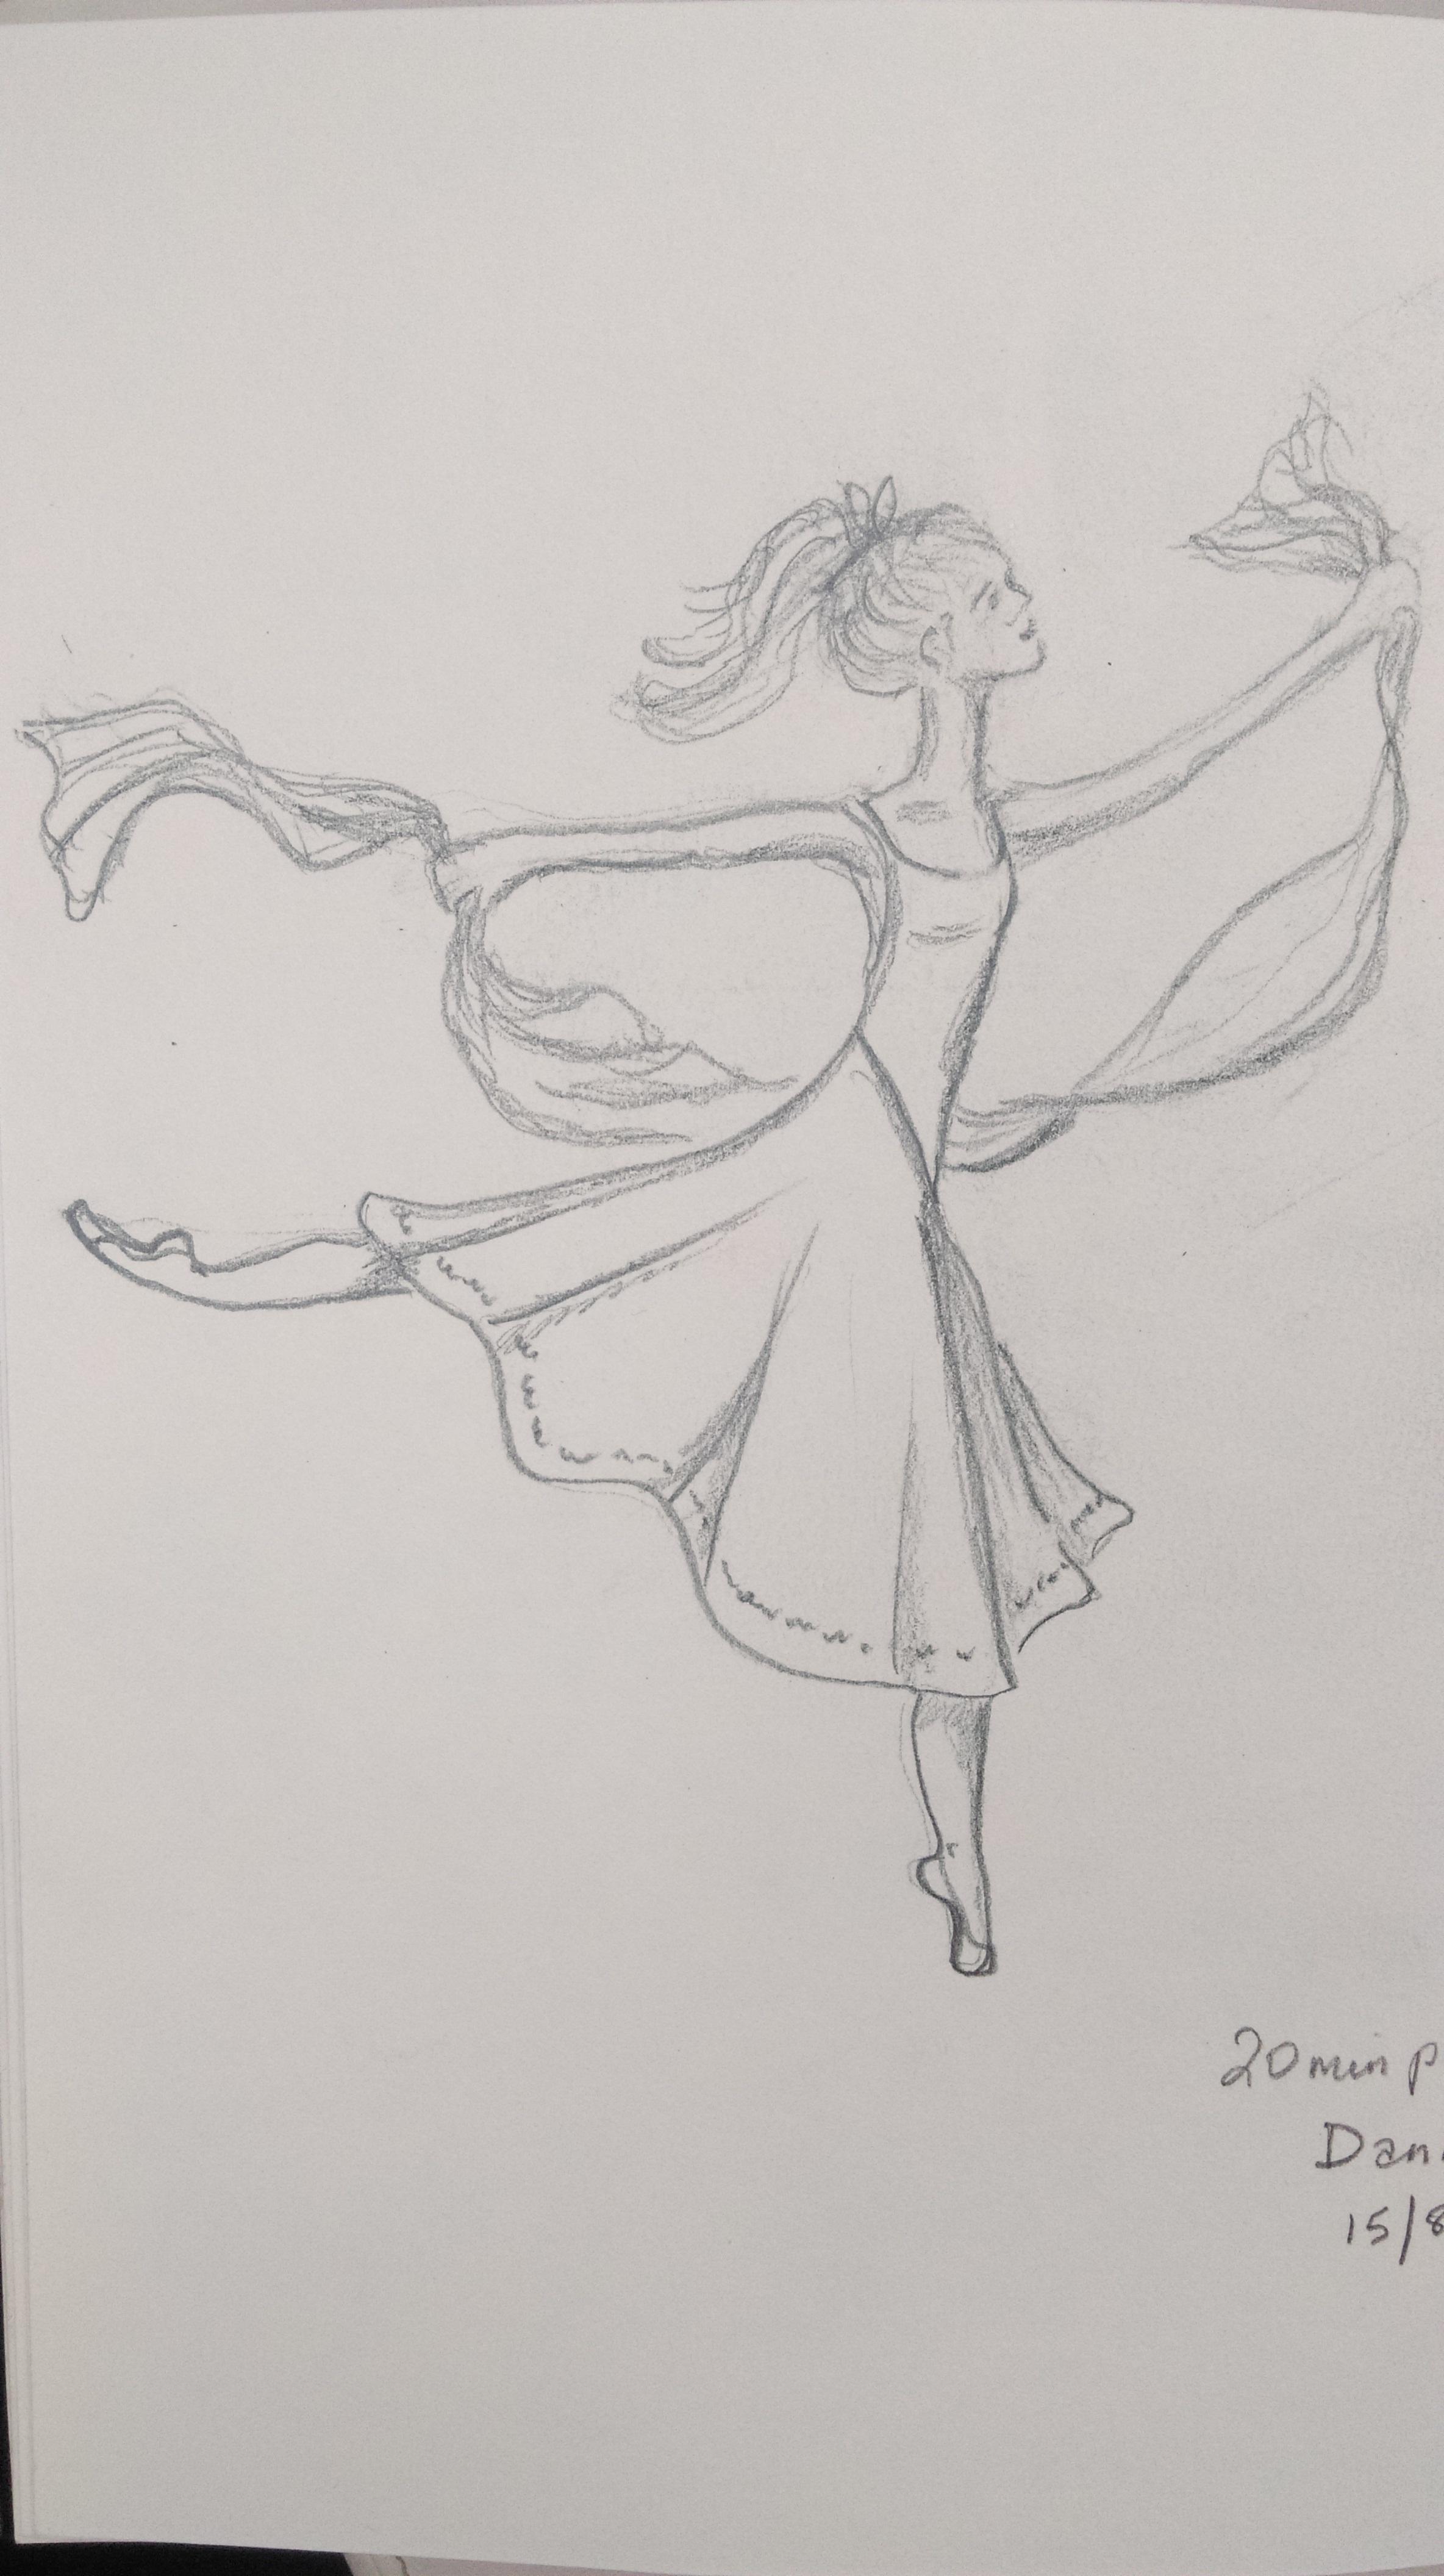 20min sketch